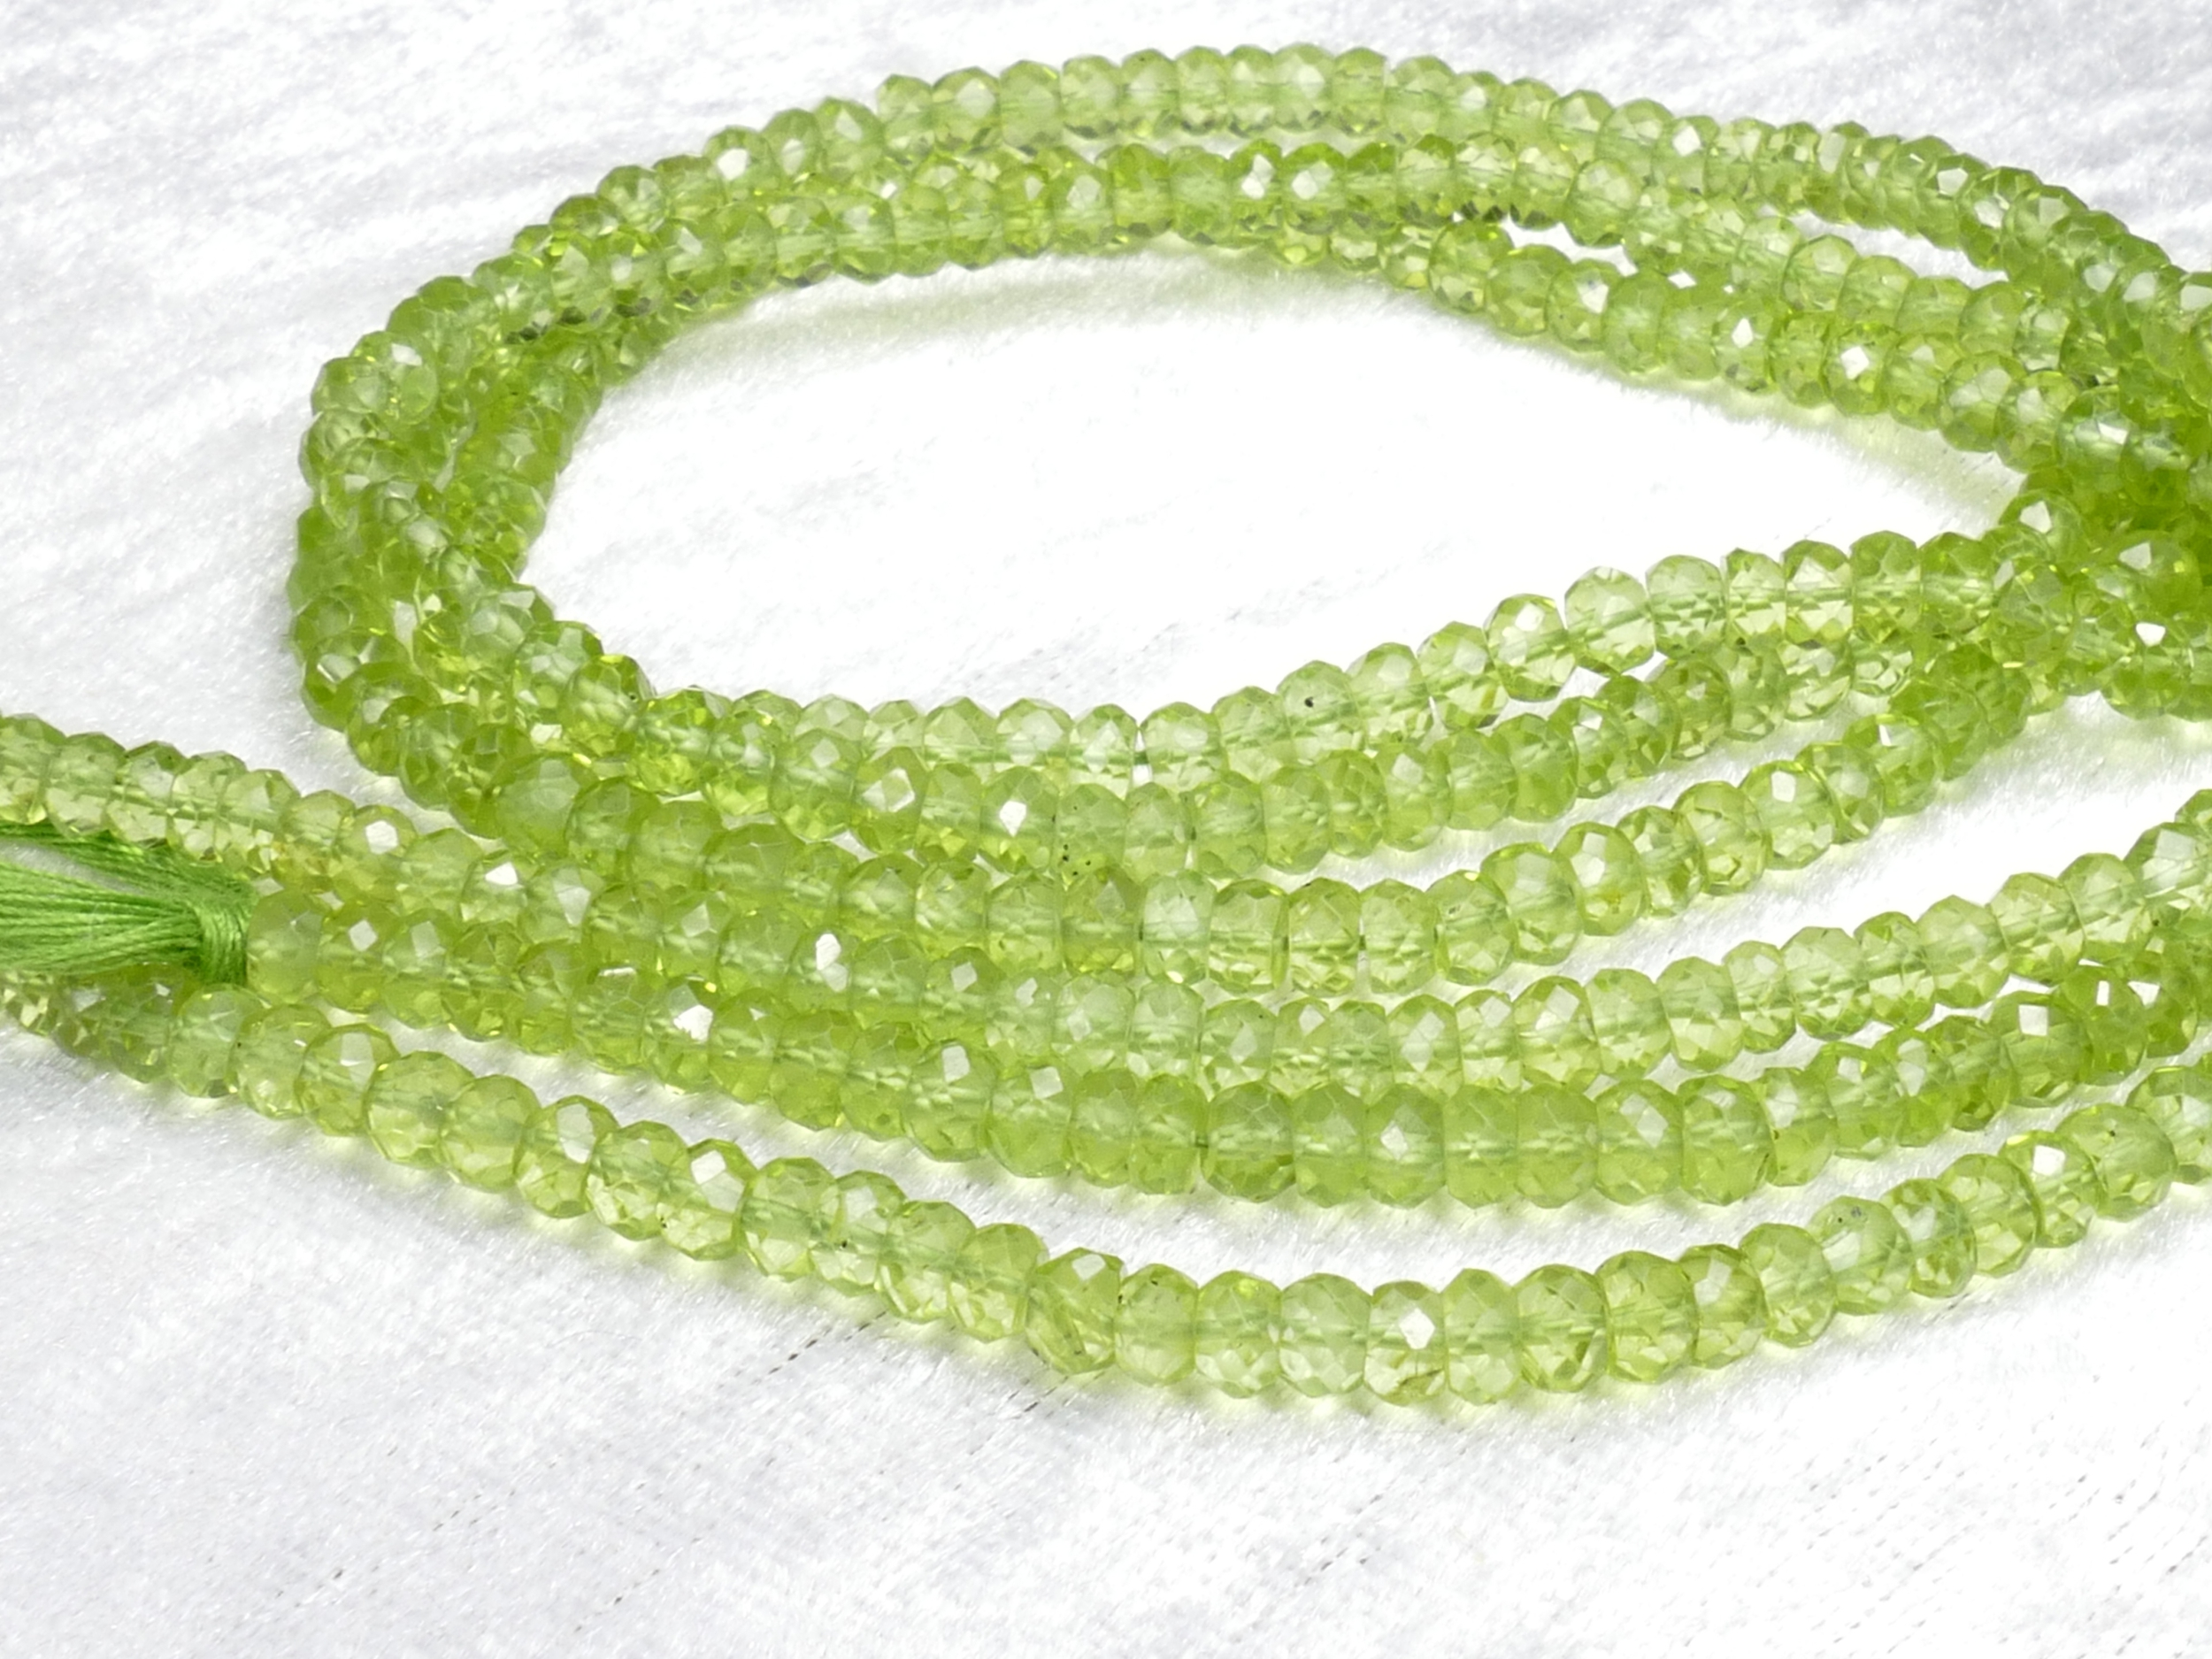 4/4.7mm AAA Perles de Péridot naturel en rondelle facettée x10cm (3.9inch) (#AC907)